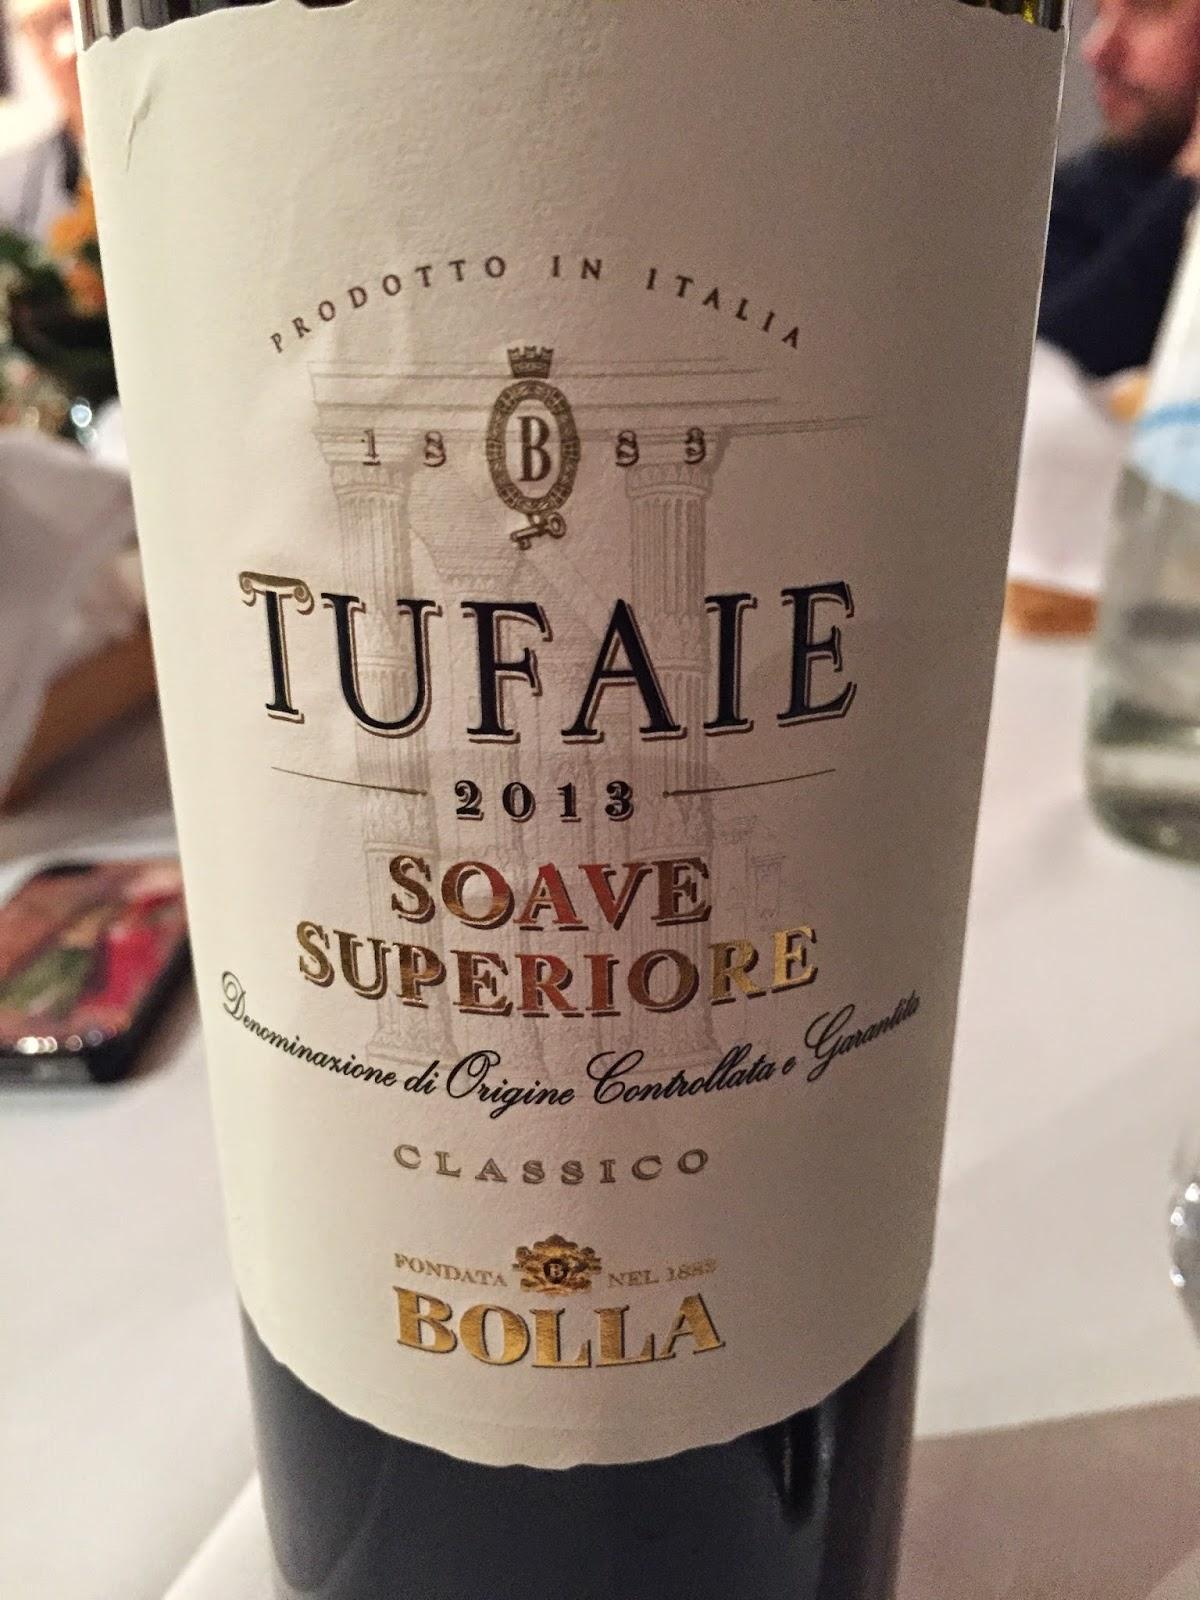 2013 Bolla Tufaie Soave Superiore Classico